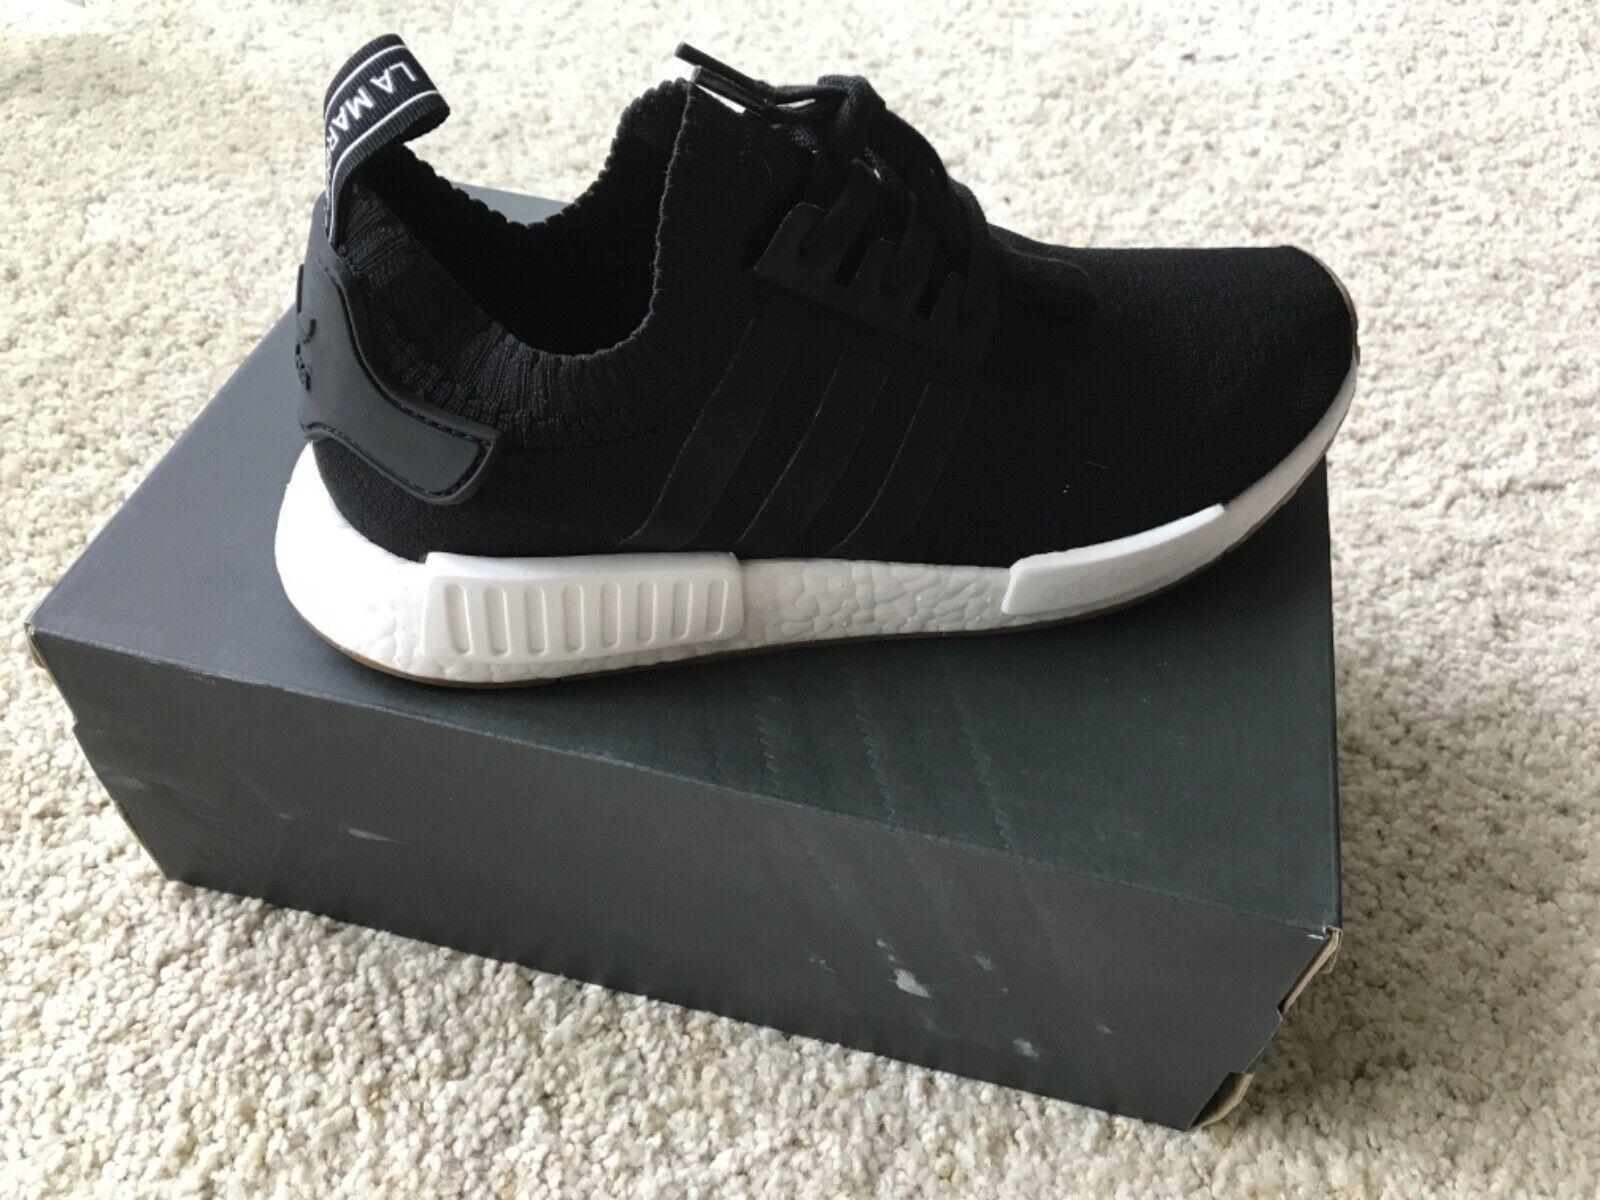 Mens Shoes Adidas Originals NMD R1 PK Gum Pack Core Black Gum White BY1887 by1887